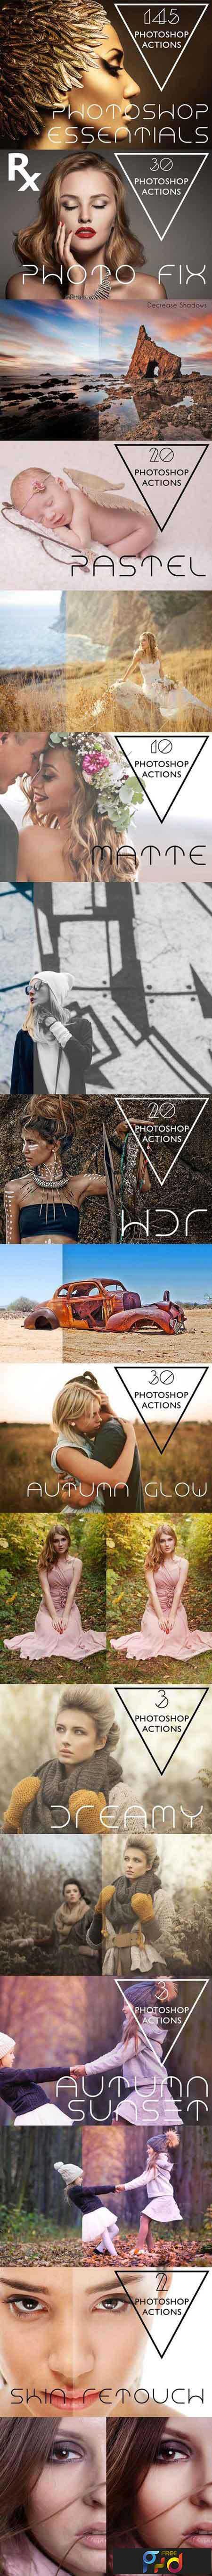 freepsdvn-com_1477626342_145-pro-photoshop-actions-977670